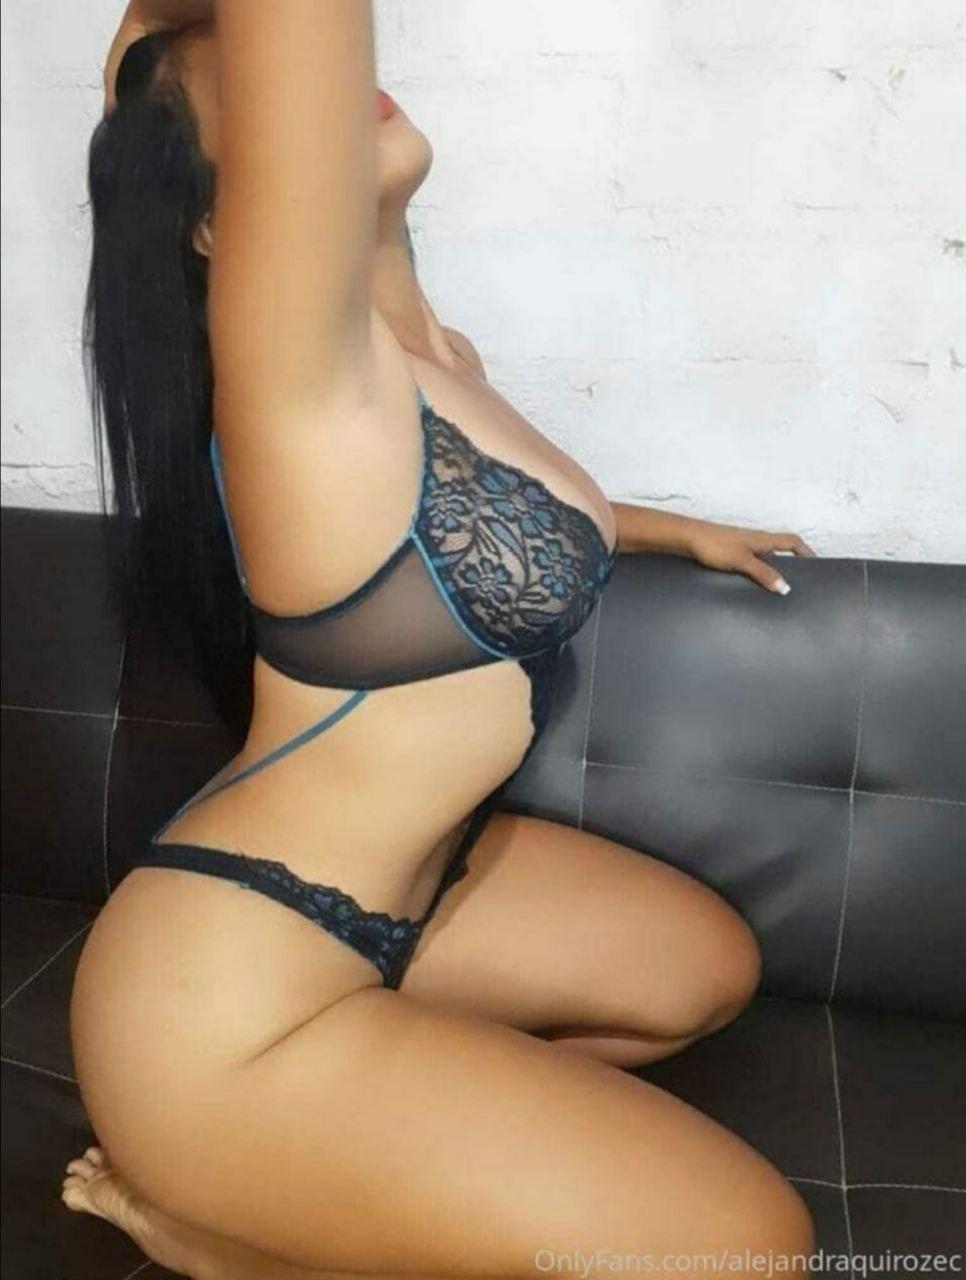 https://images2.imgbox.com/a0/91/PMkQsikk_o.jpg